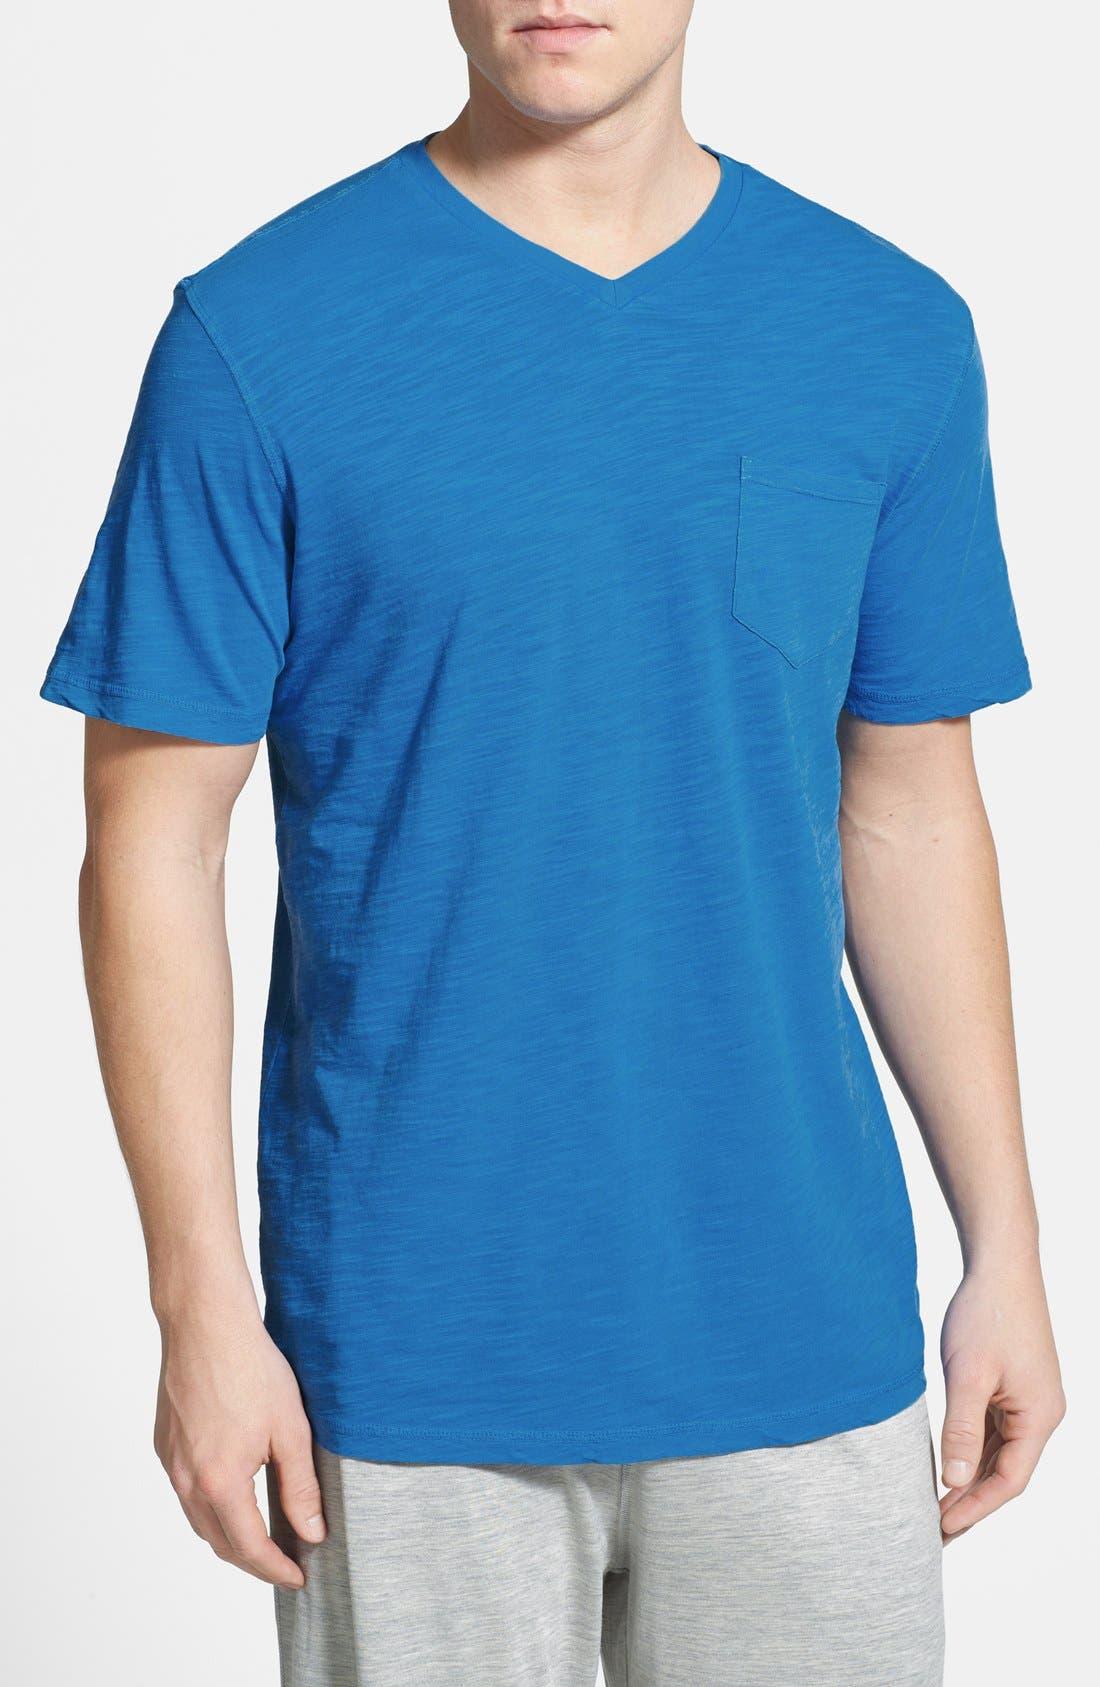 Alternate Image 1 Selected - Daniel Buchler Cotton Slub T-Shirt